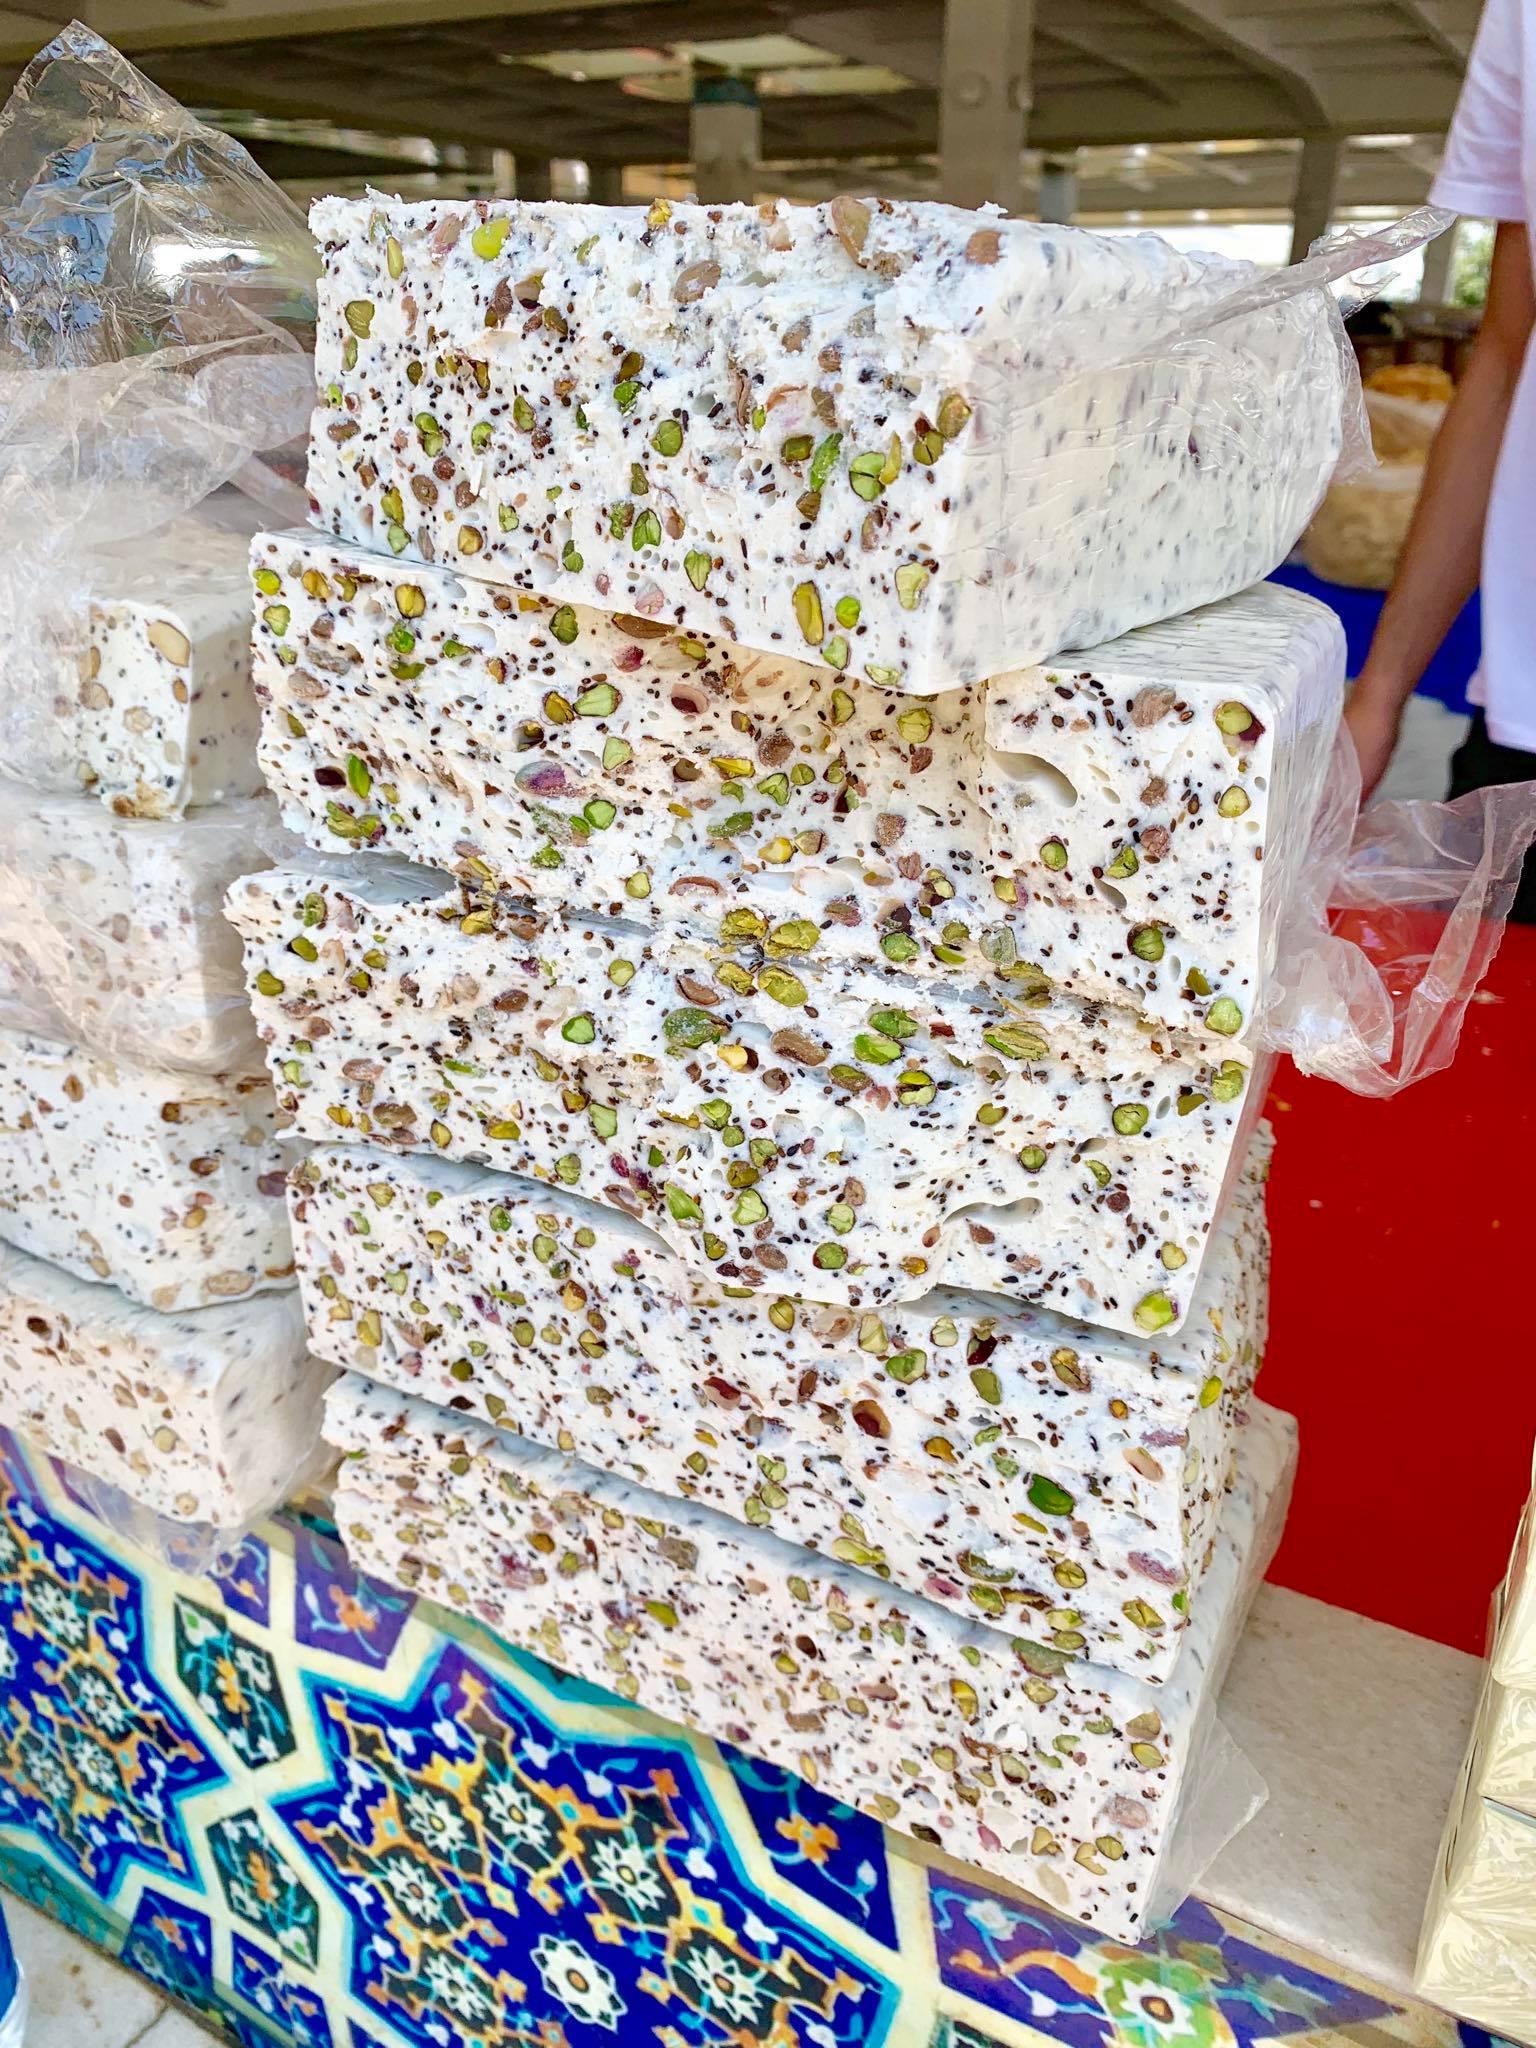 Kach Solo Travels in 2019 Siyab Bazaar and Registan on my first day in Samarkand19.jpg